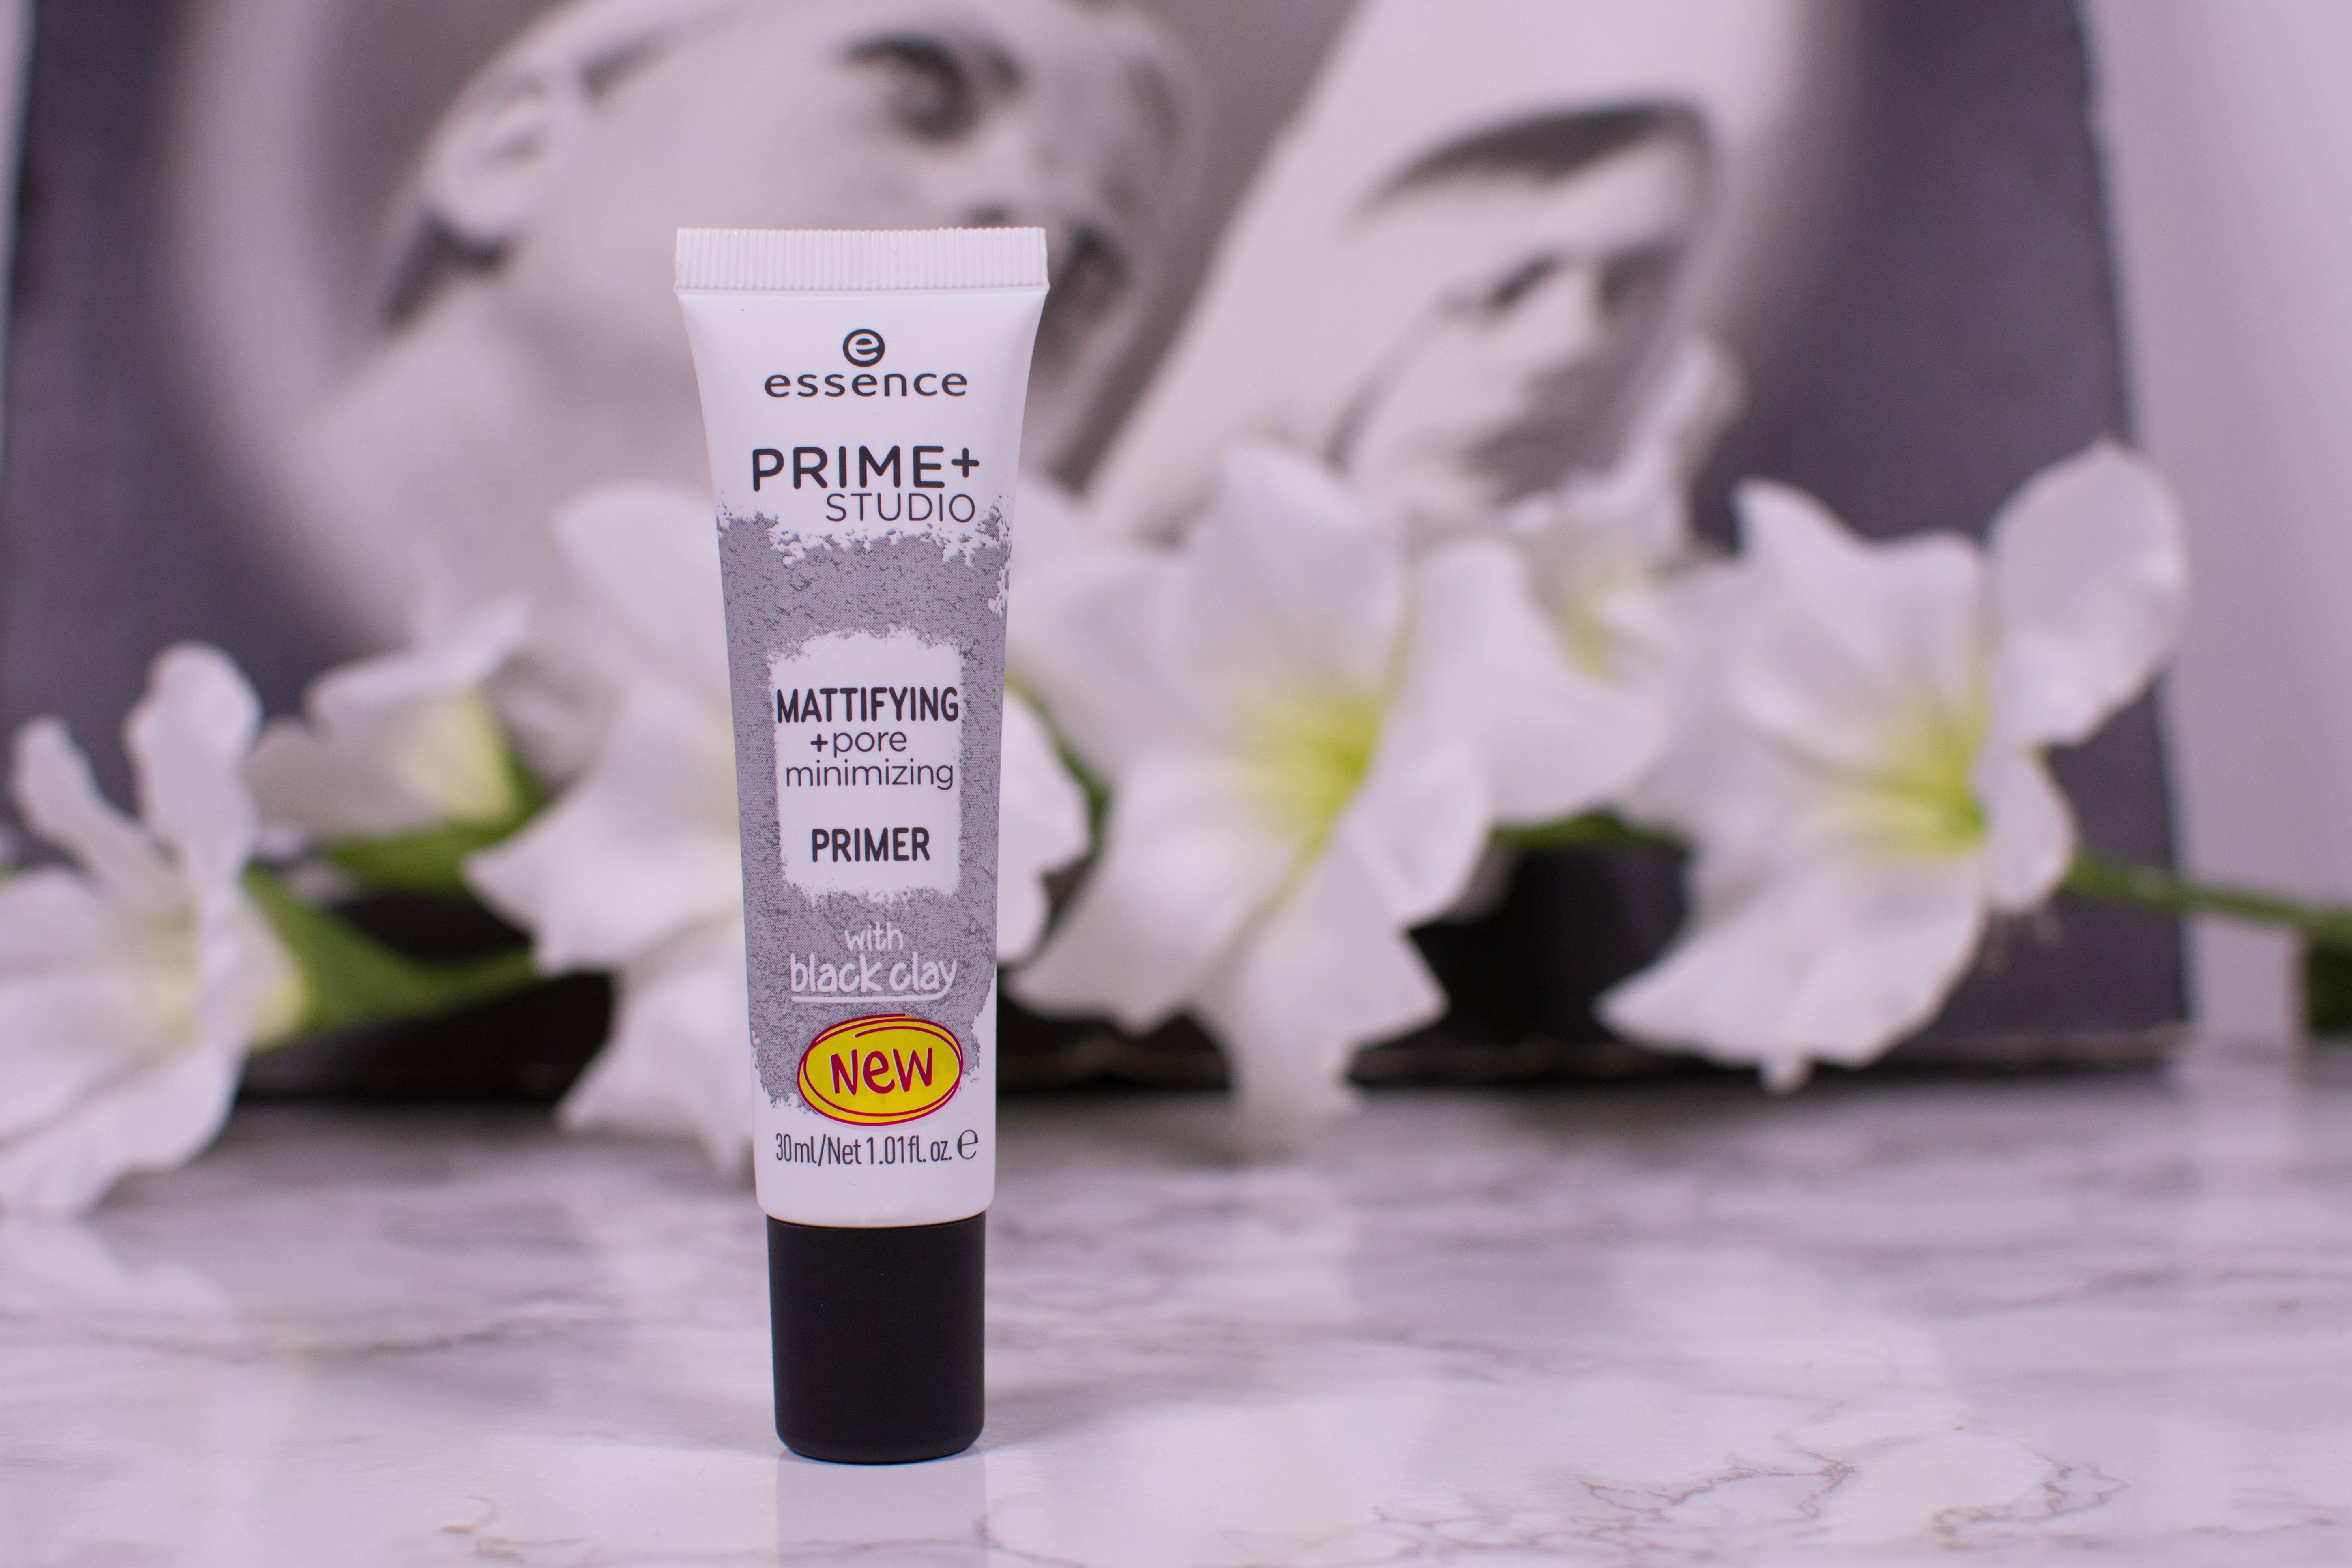 essence prime + studio mattiyfing + pore minimizing primer with black clay